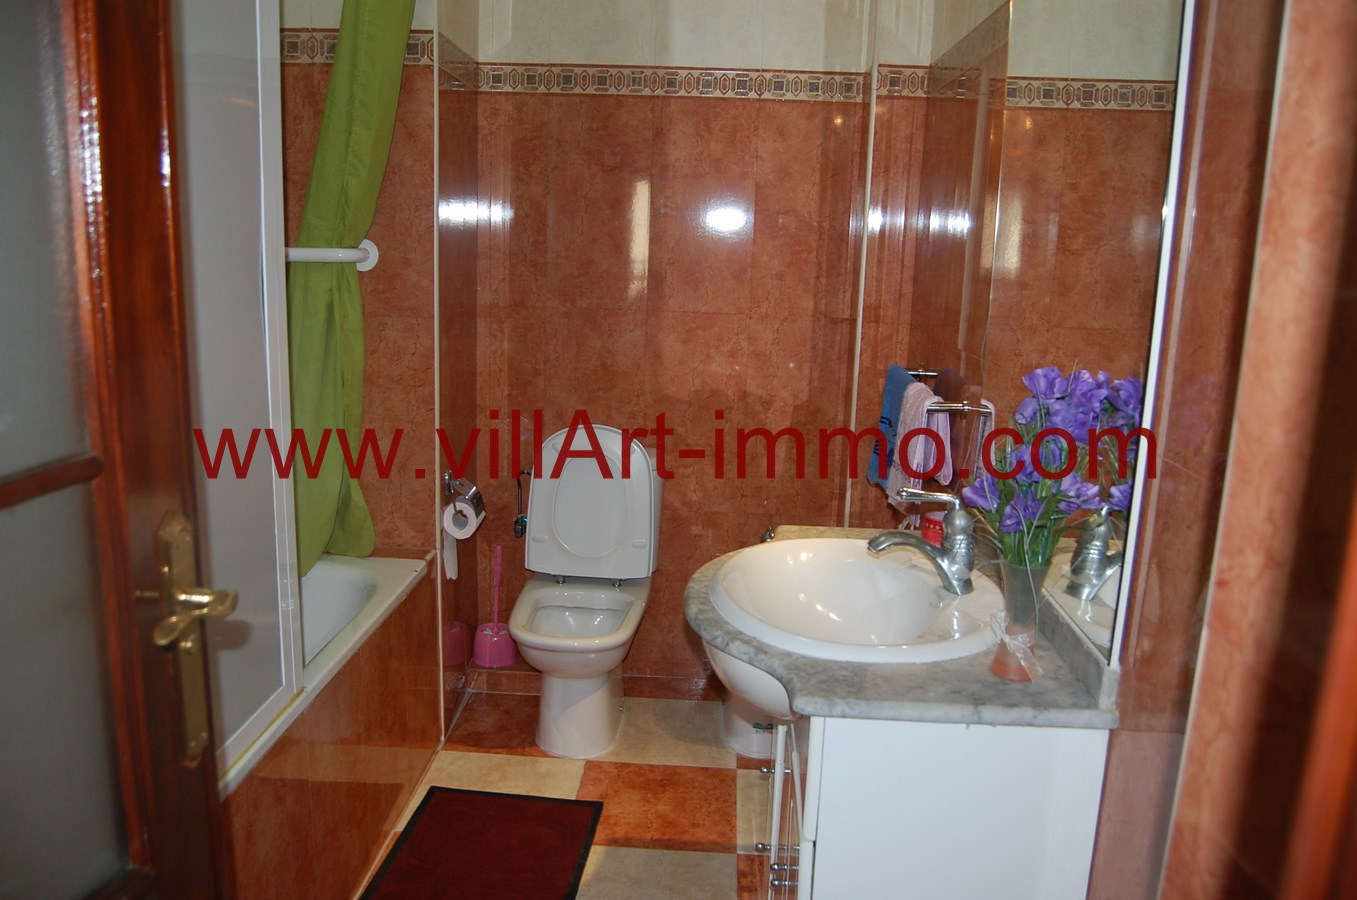 8-vente-appartement-tanger-iberia-salle-de-bain-1-va435-villart-immo